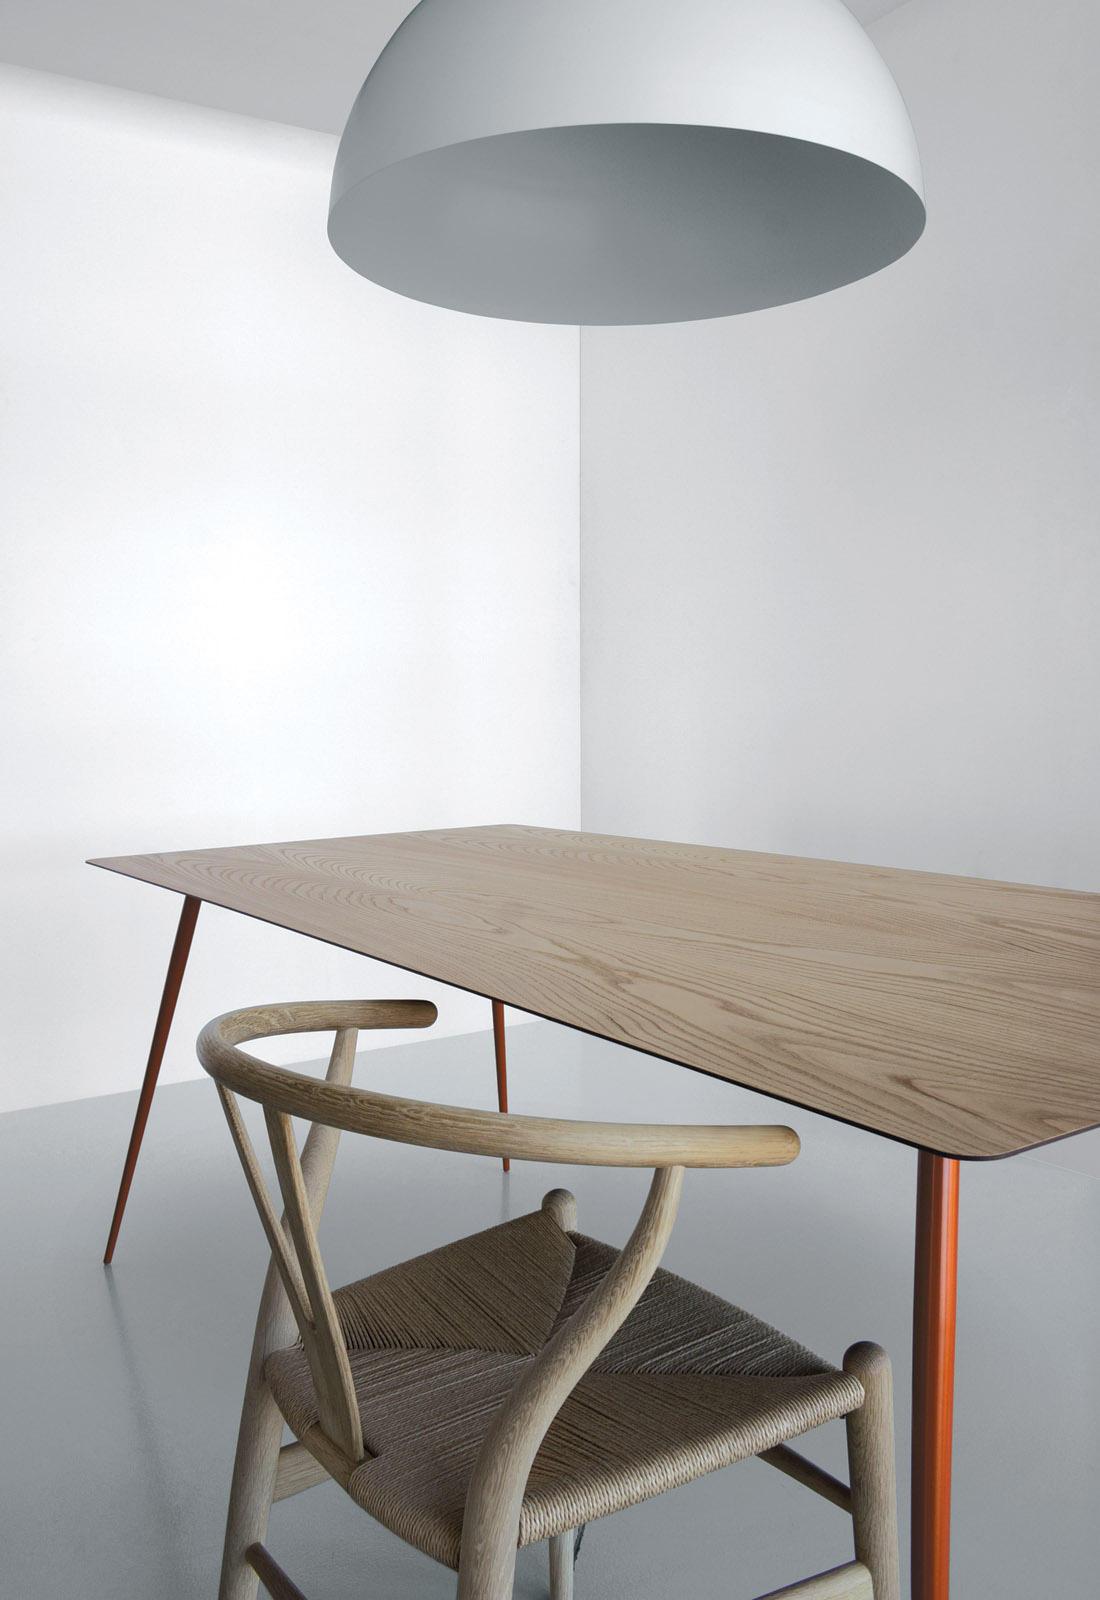 Spillo sp05 tavoli da pranzo extendo architonic for Produttori tavoli